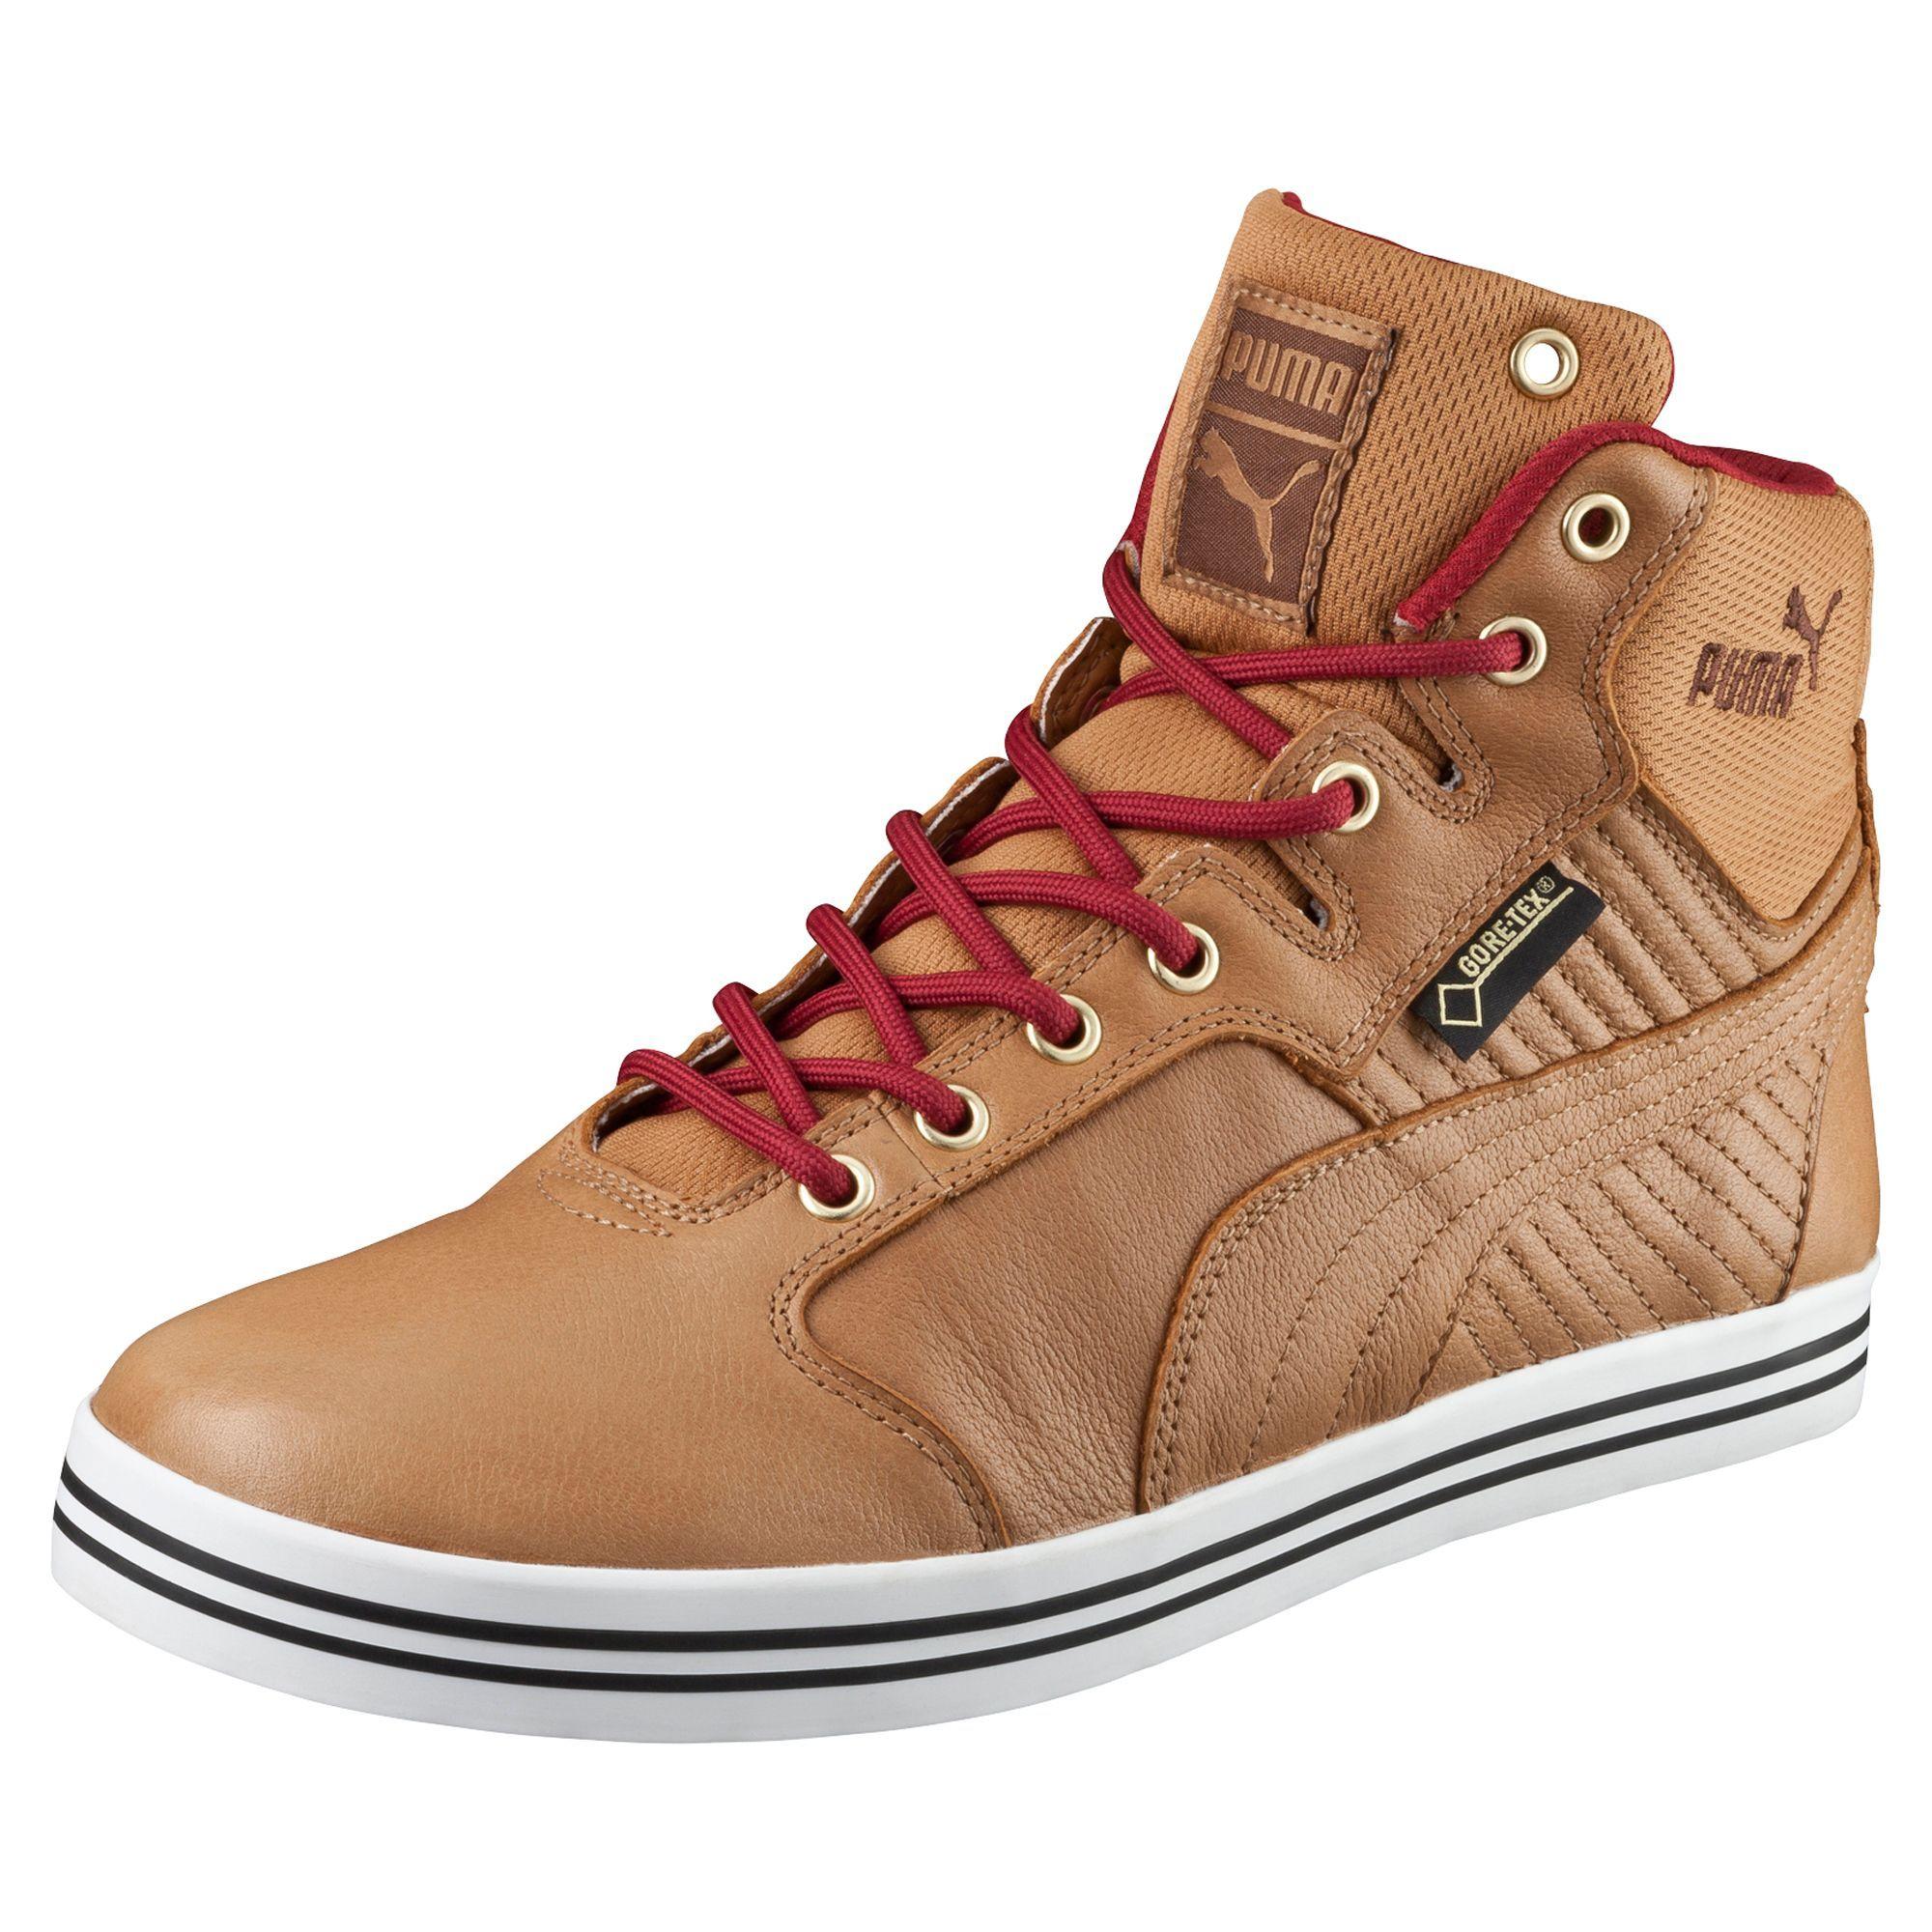 Tatau Leather GTX® Winter Shoe from Puma on Shop And Ship Worldwide: Buy Tatau Leather GTX® Winter Shoe by PUMA